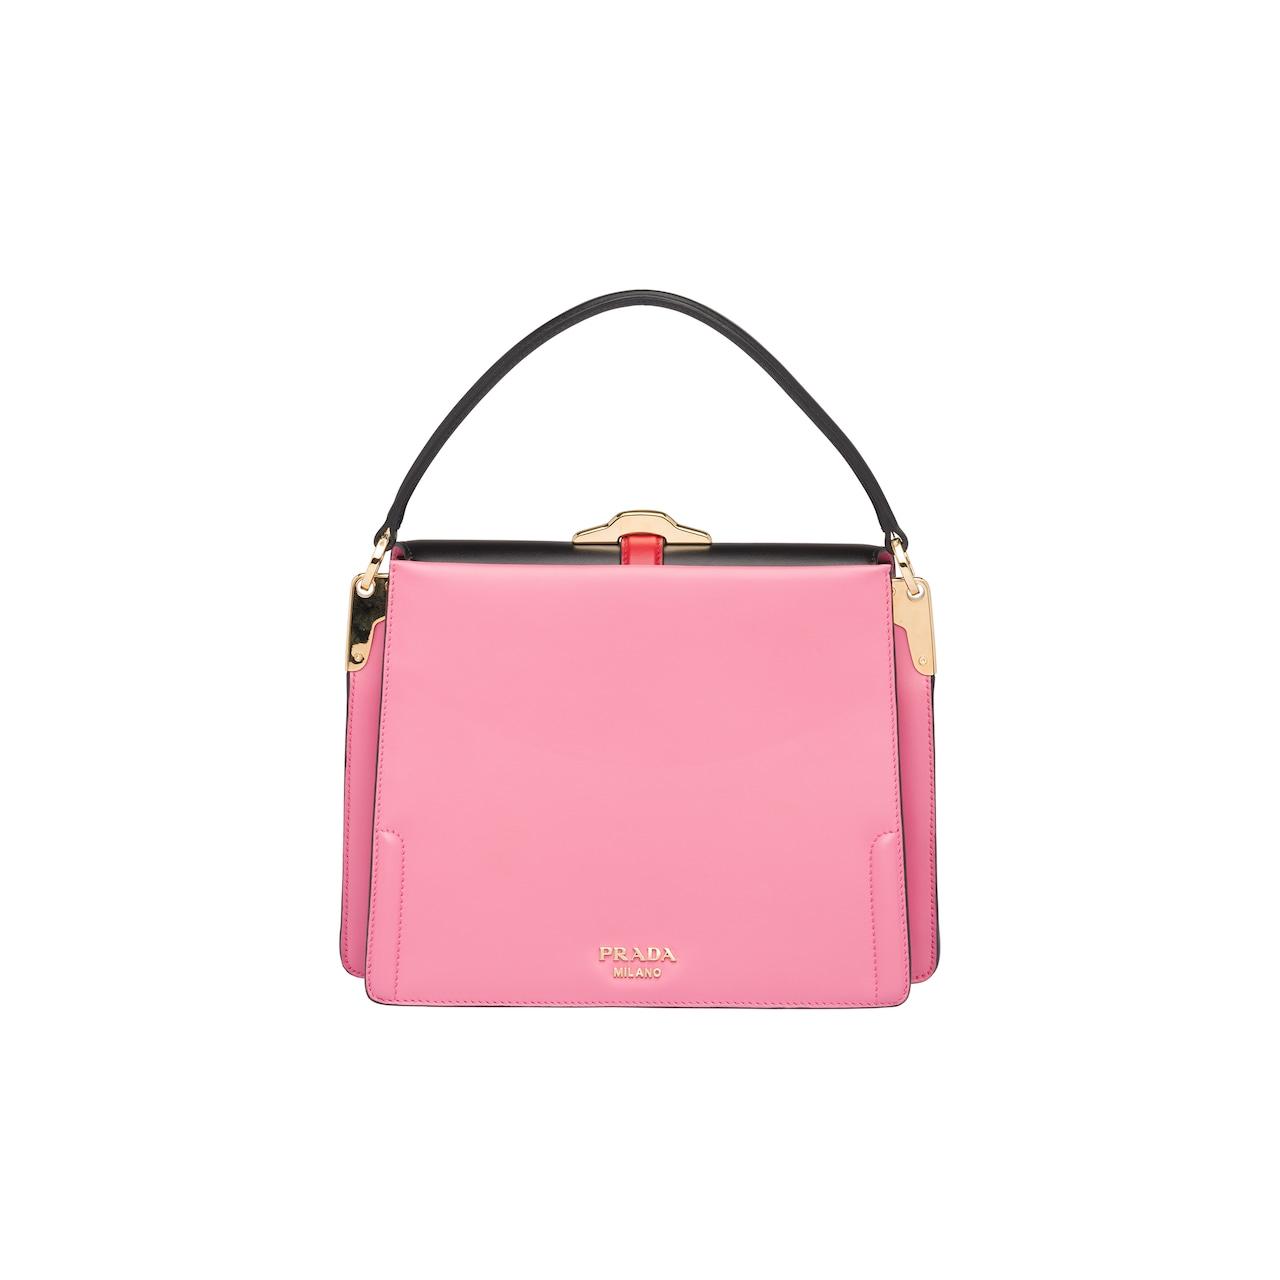 5a611dc6ed67 Prada Belle leather bag | Prada - 1BN004_2AIX_F0YN8_V_OOO